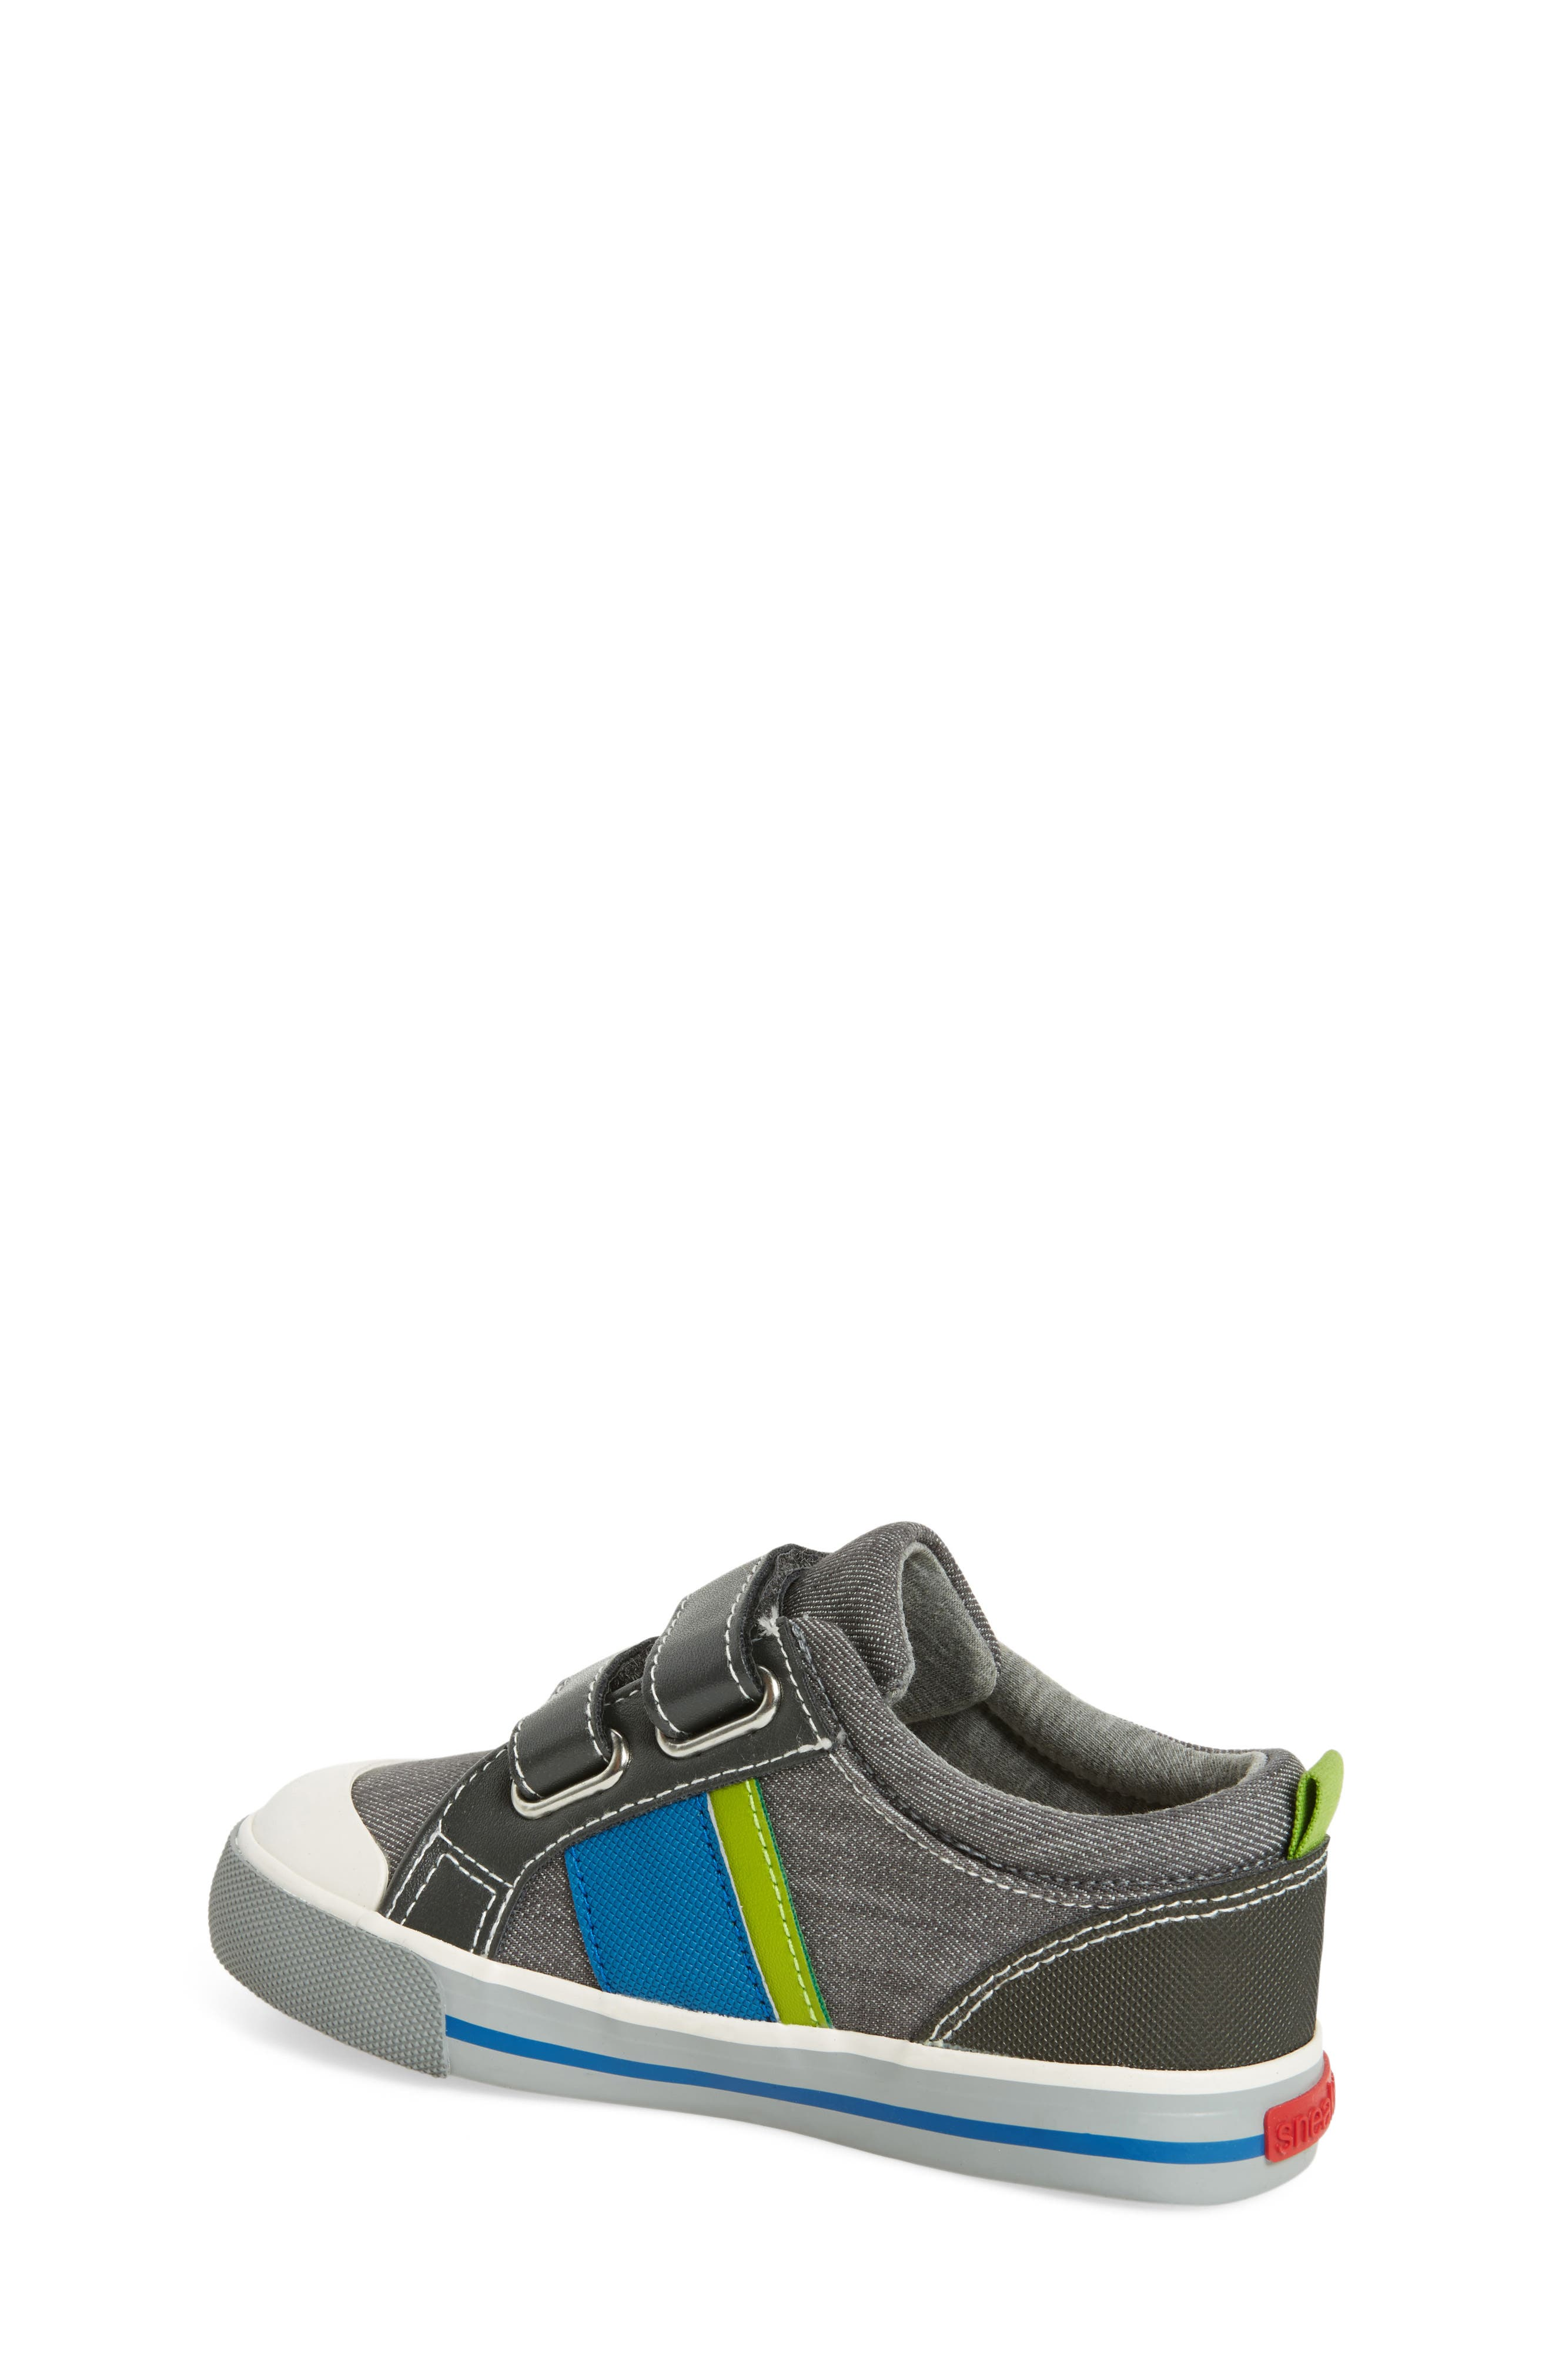 Russell Sneaker,                             Alternate thumbnail 2, color,                             Grey Denim